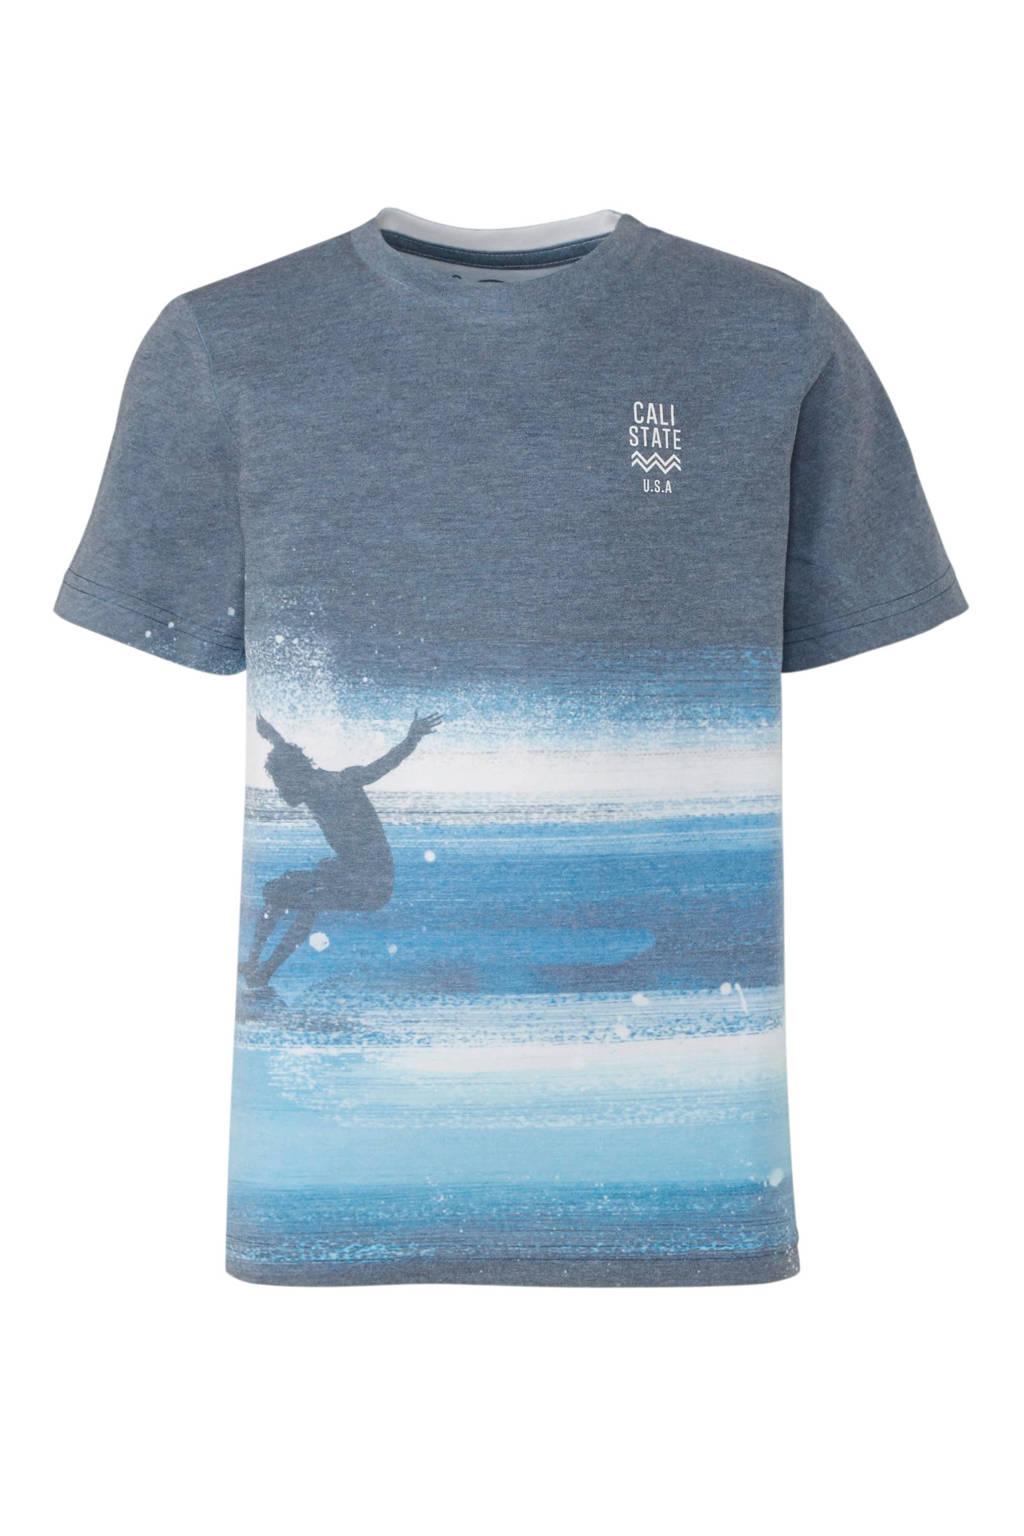 C&A Here & There T-shirt met printopdruk blauw, Blauw/wit